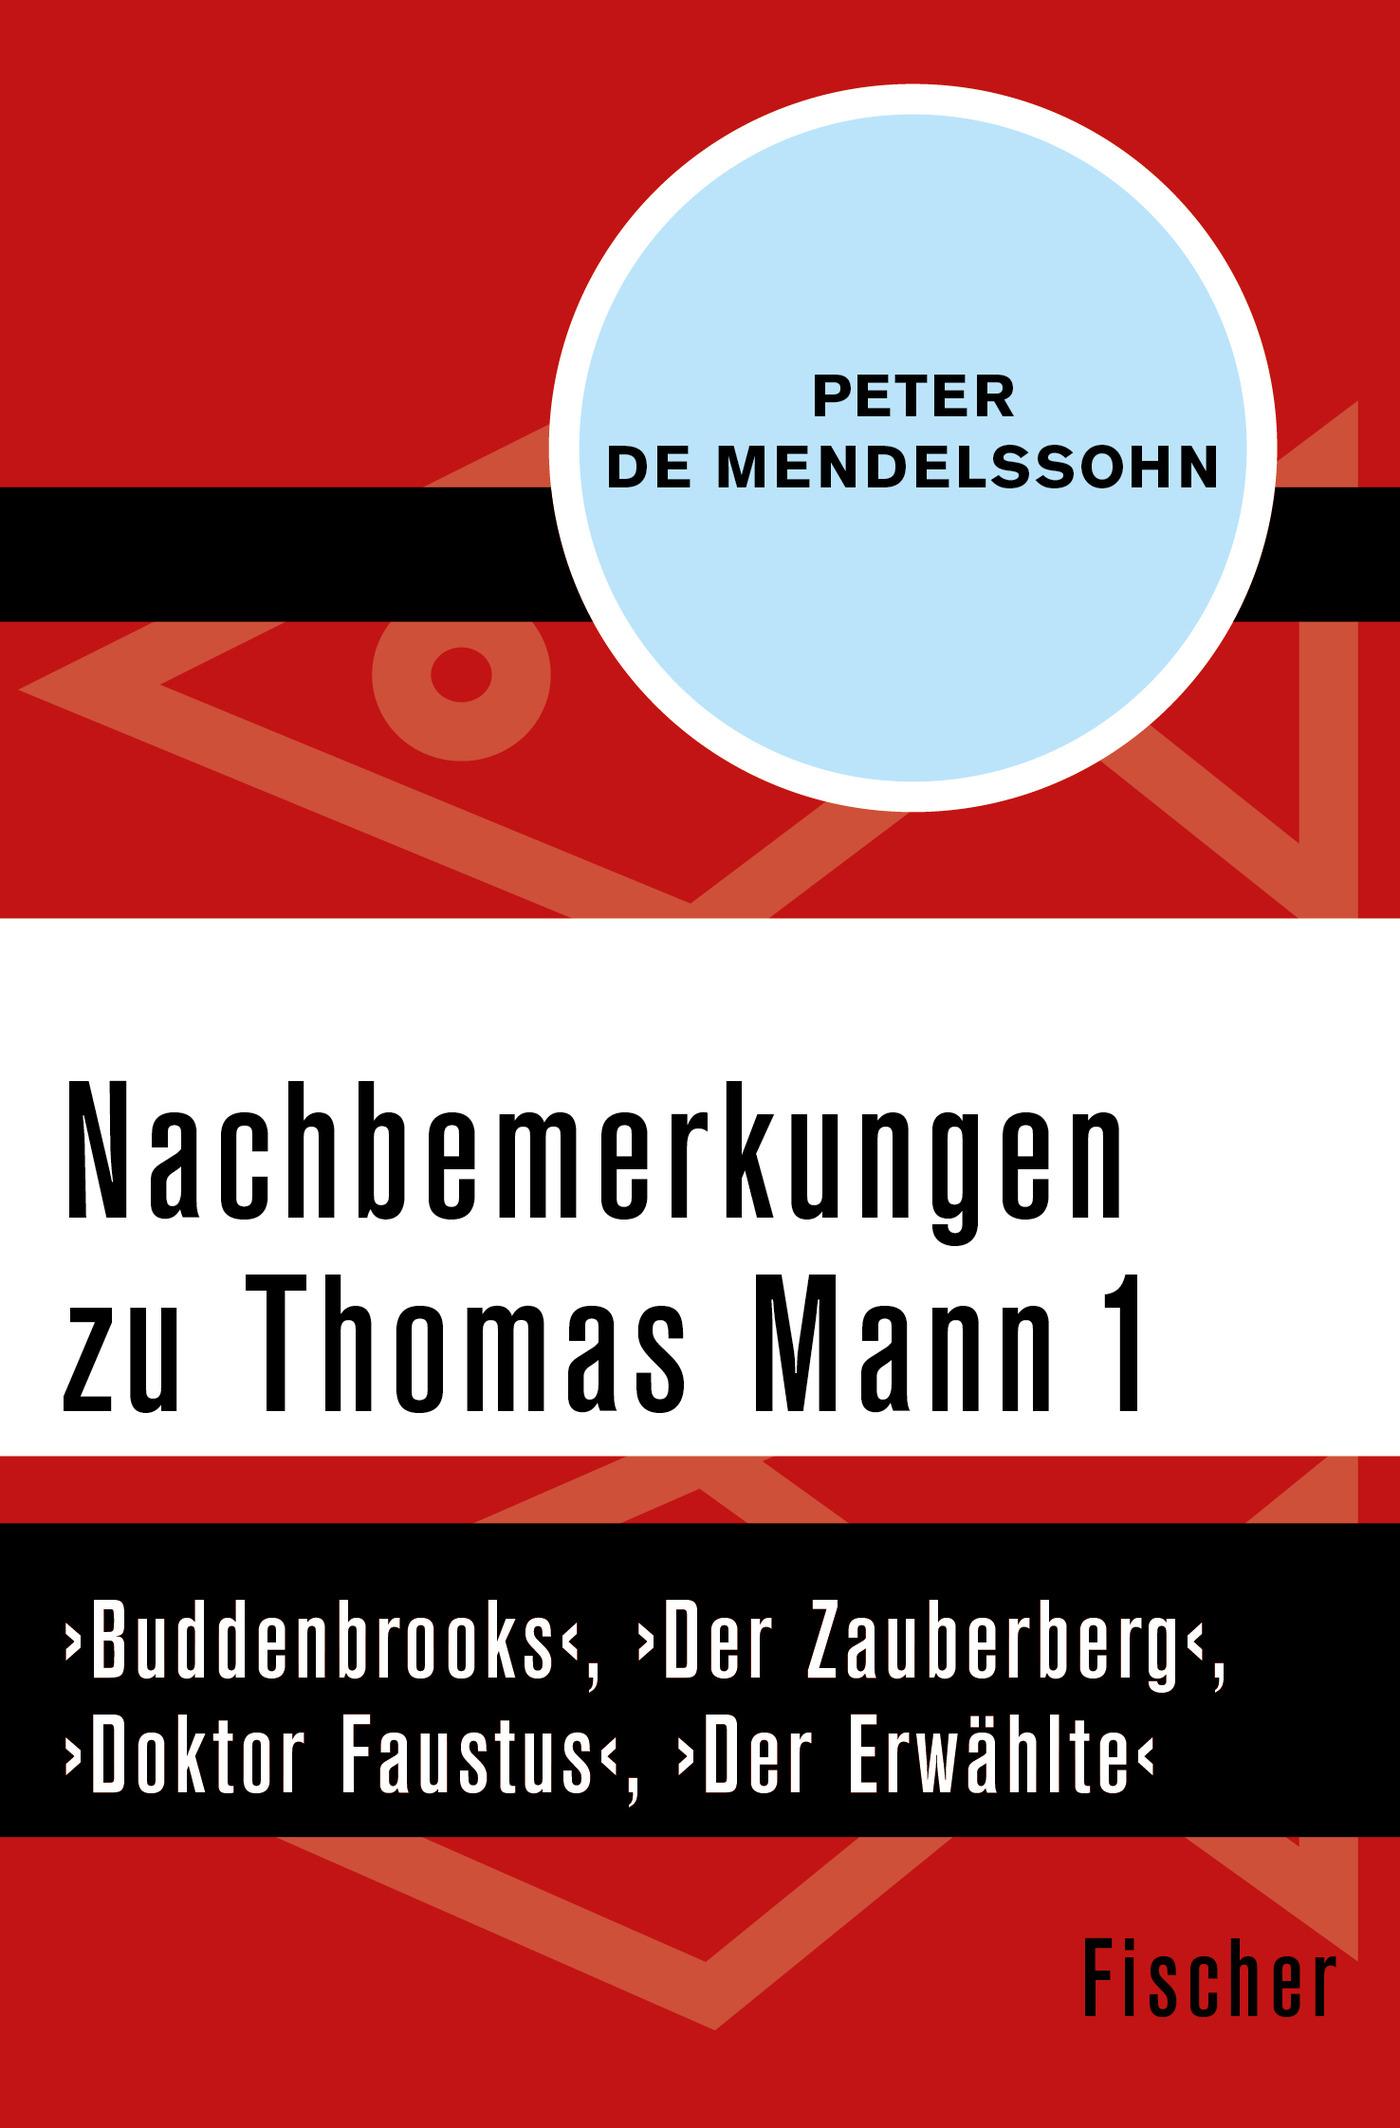 Peter-Mendelssohn-Nachbemerkungen-zu-Thomas-Mann-1-9783596311156